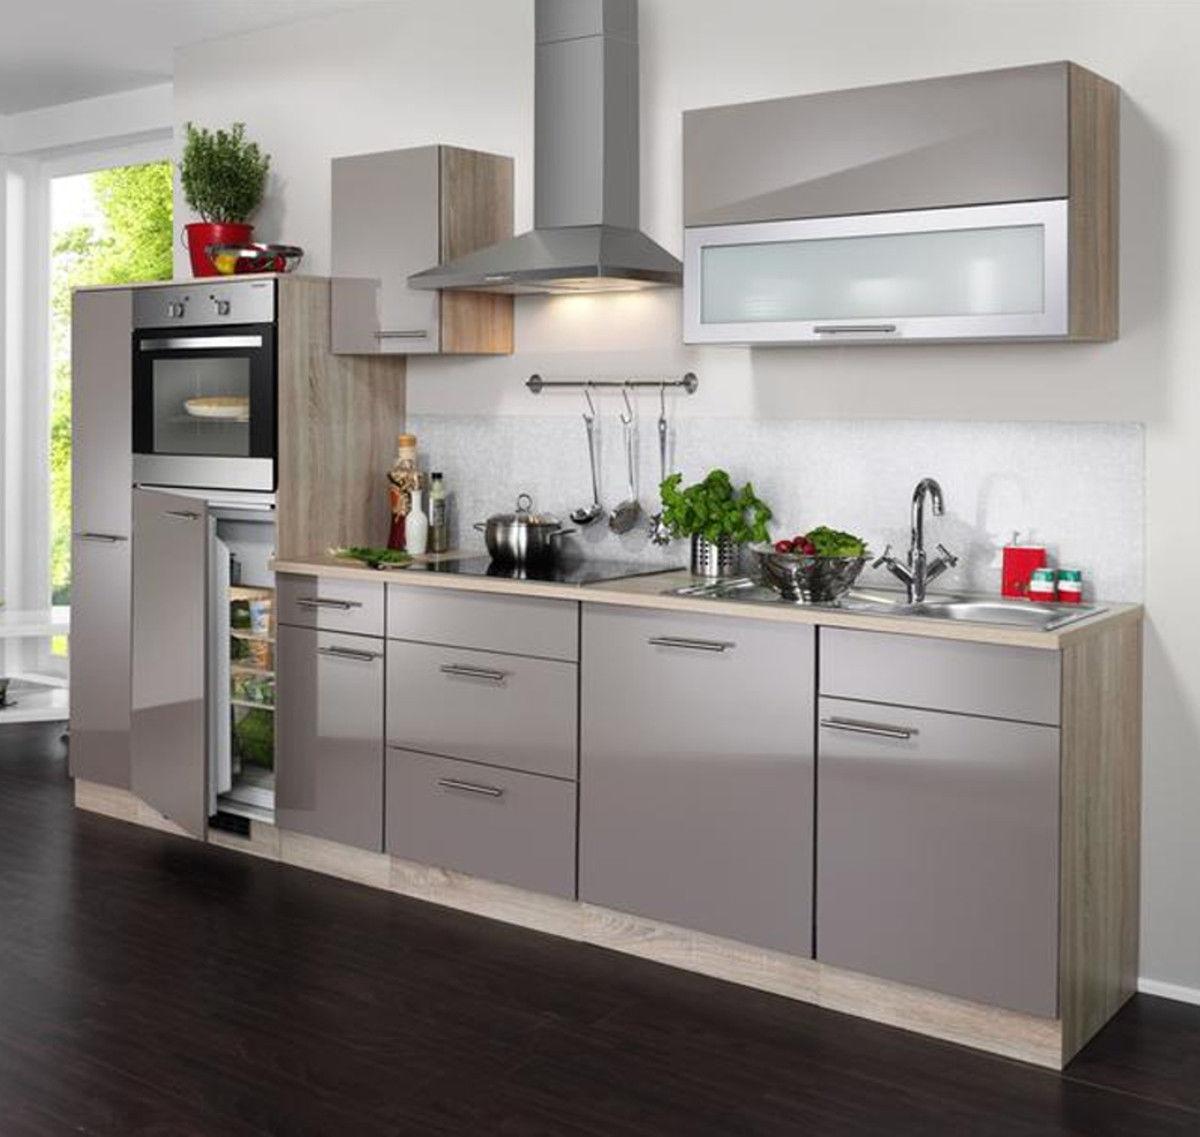 Wunderbar Unter Schrankbeleuchtung Küche Bewertungen Fotos - Ideen ...